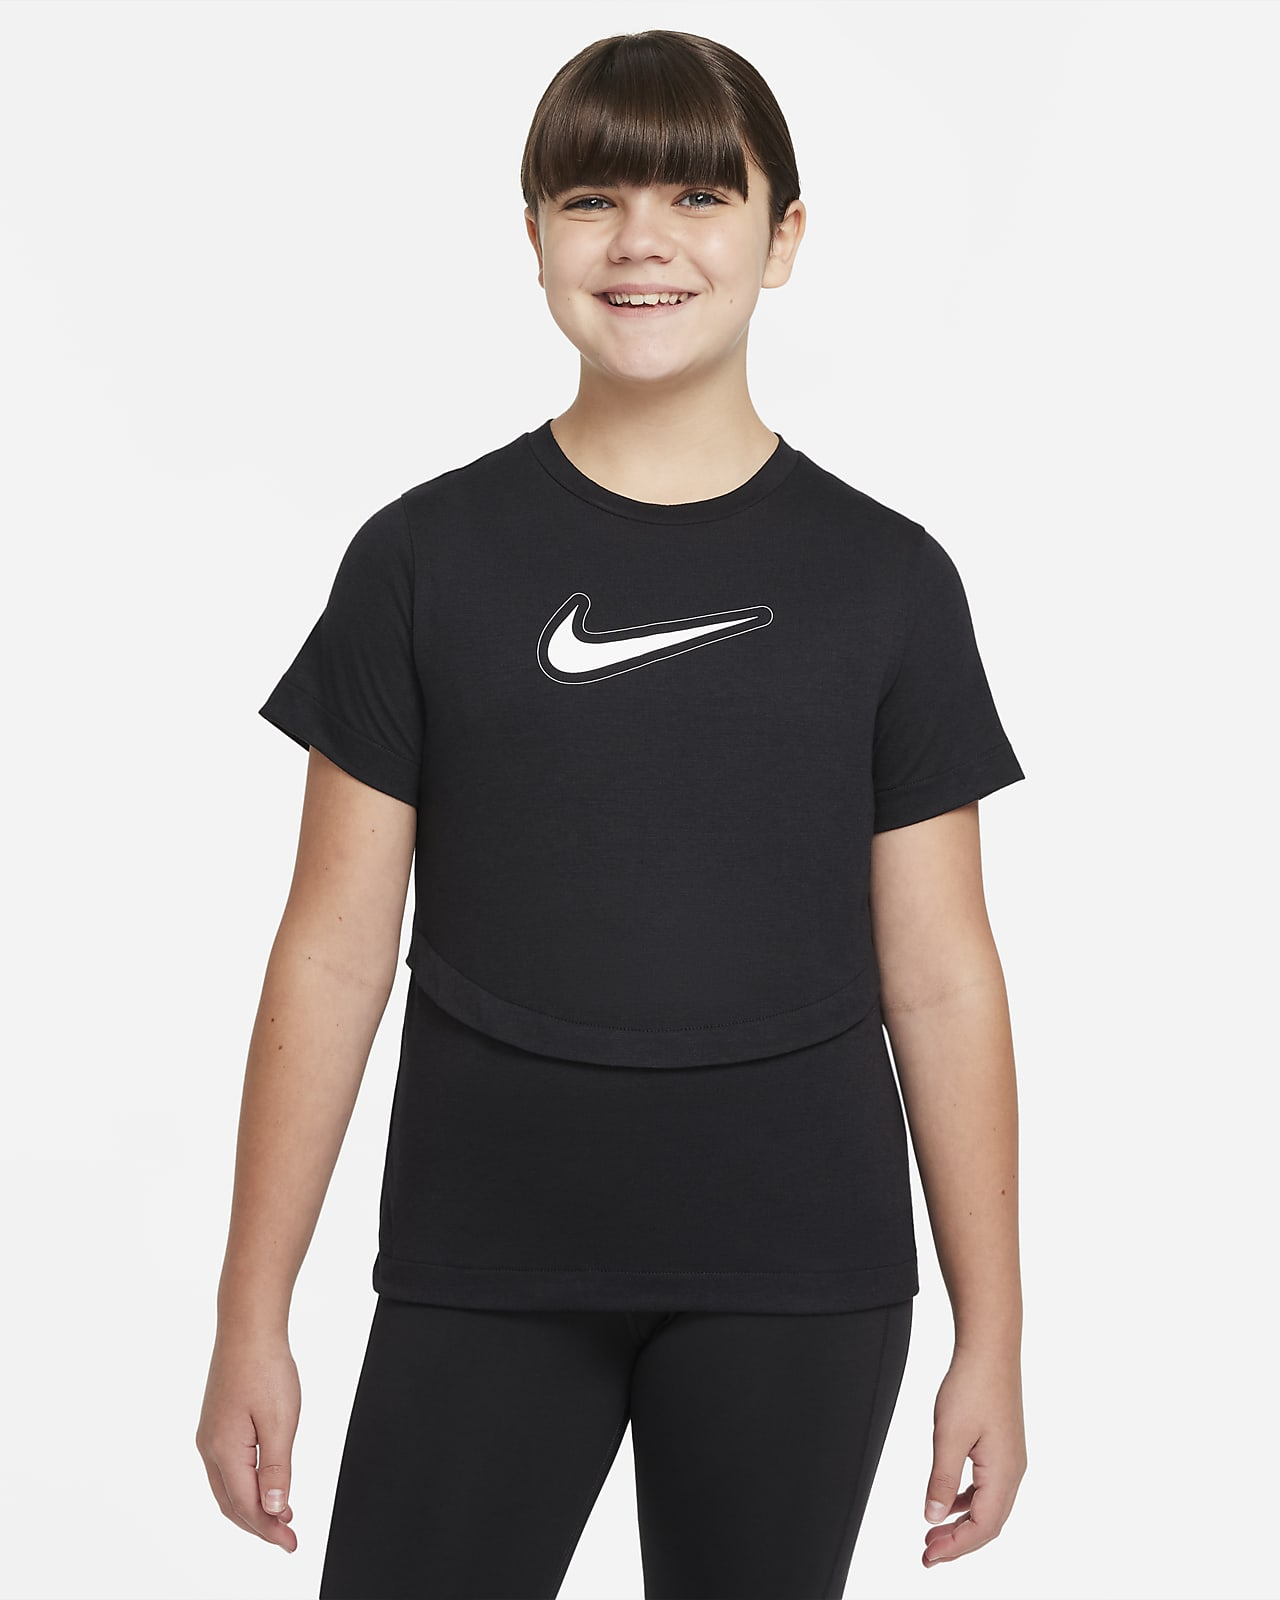 Nike Dri-FIT Trophy Camiseta de entrenamiento de manga corta (Talla grande) - Niña